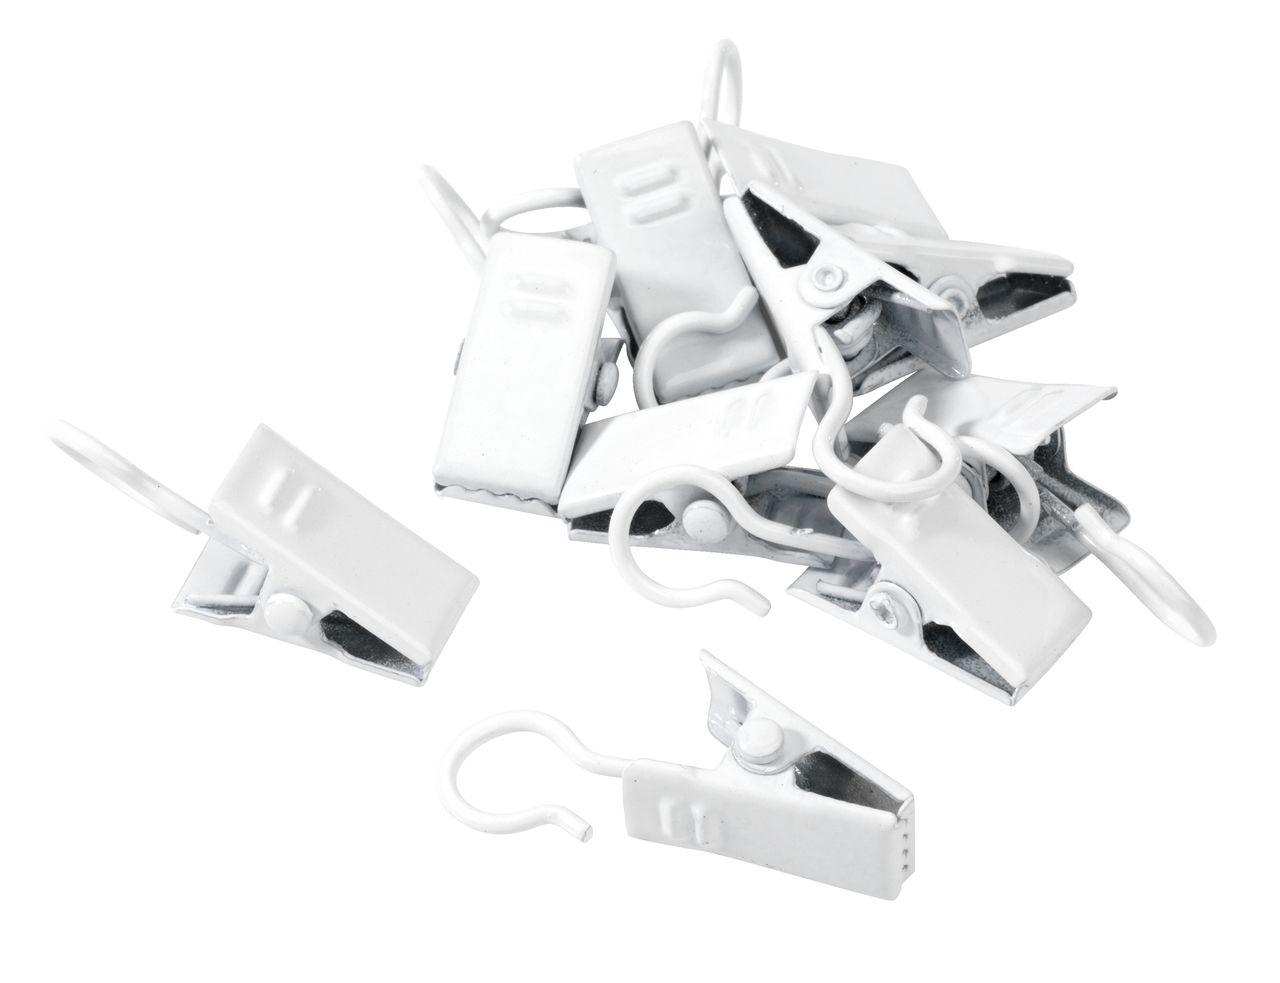 Gordijnhaak met klem 10stpk wit  JYSK